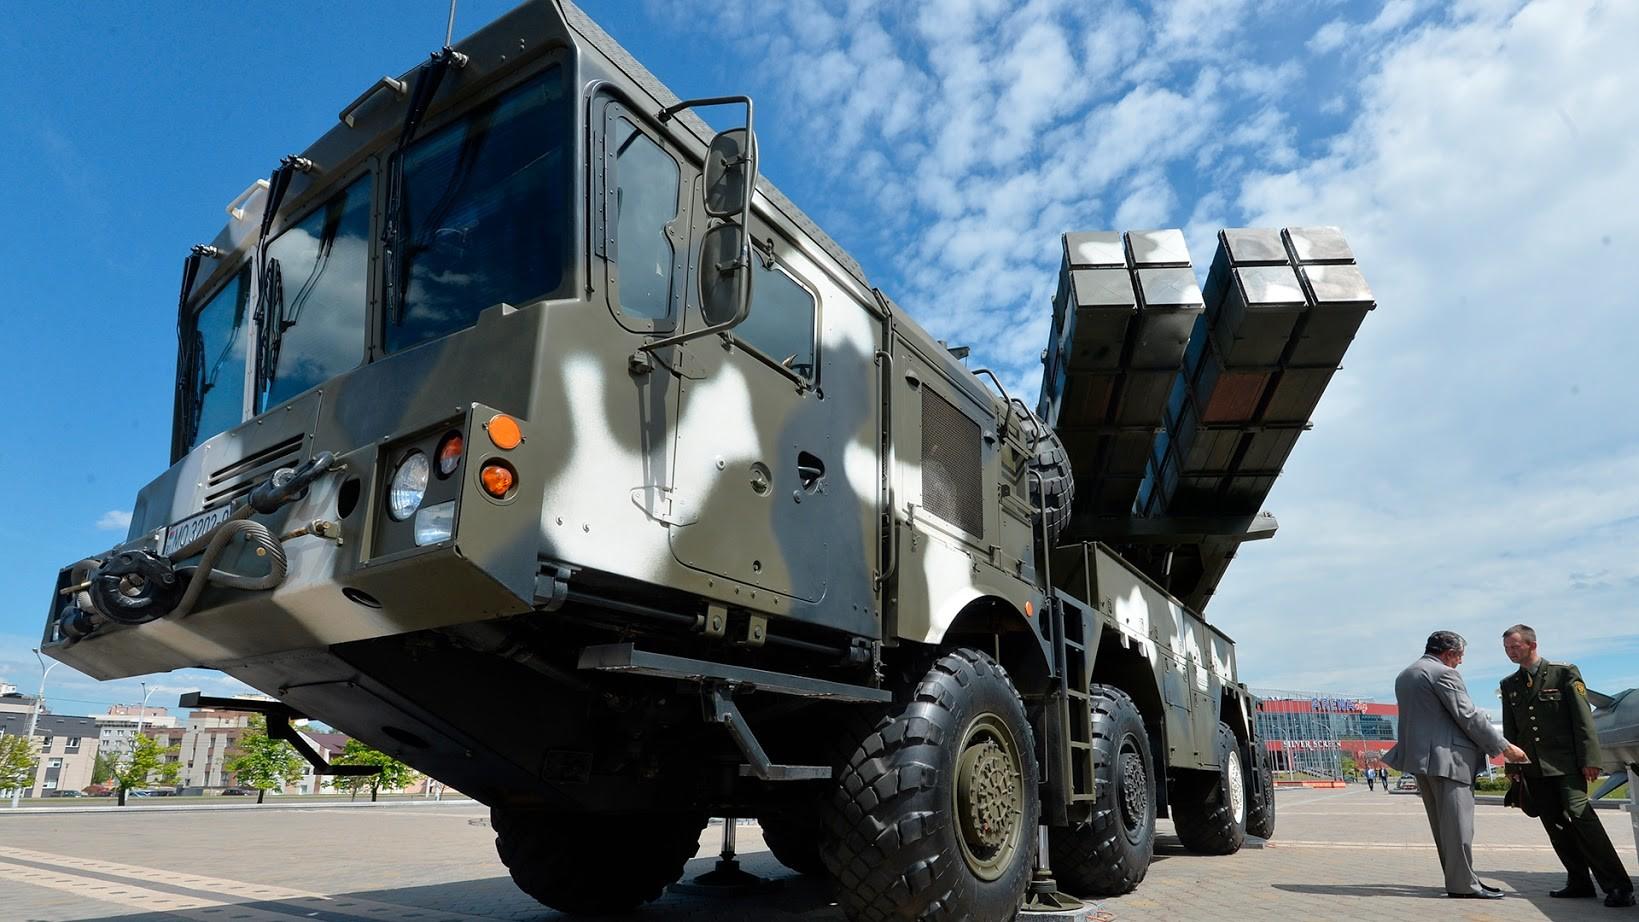 Raketni sistem Polonez na 8. mednarodnem orožarskem sejmu v Minsku.